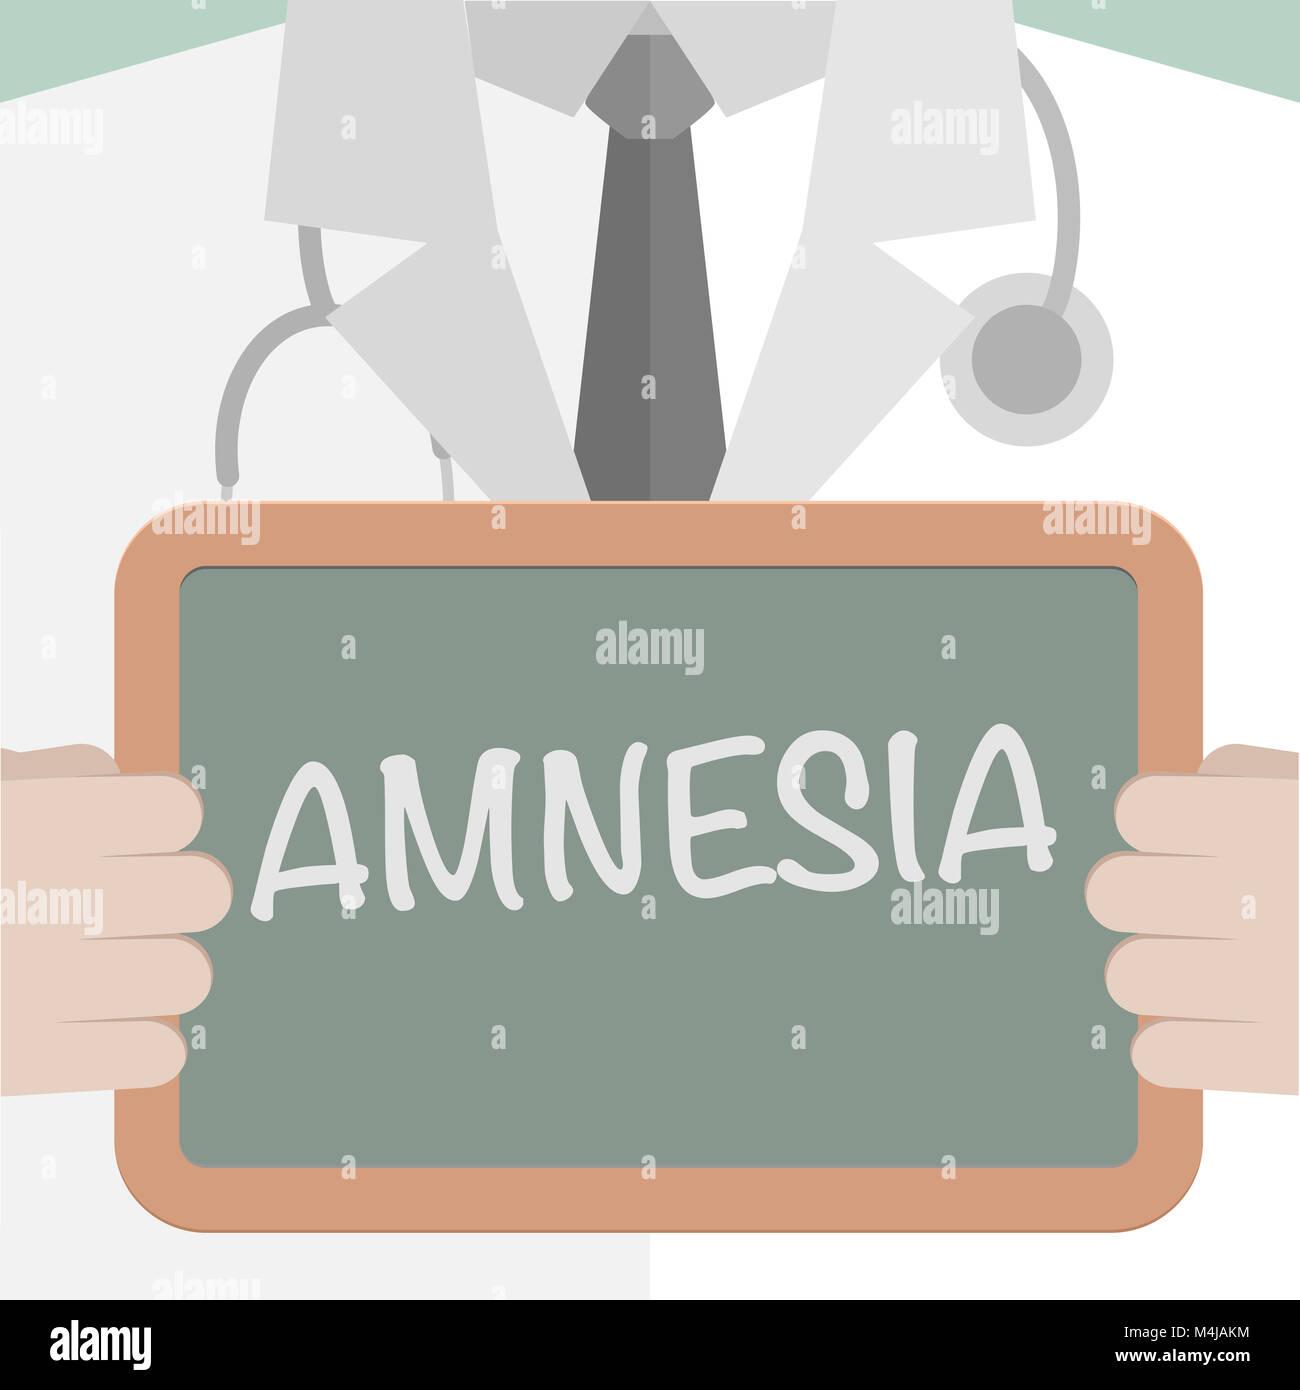 Medical Board Amnesia - Stock Image